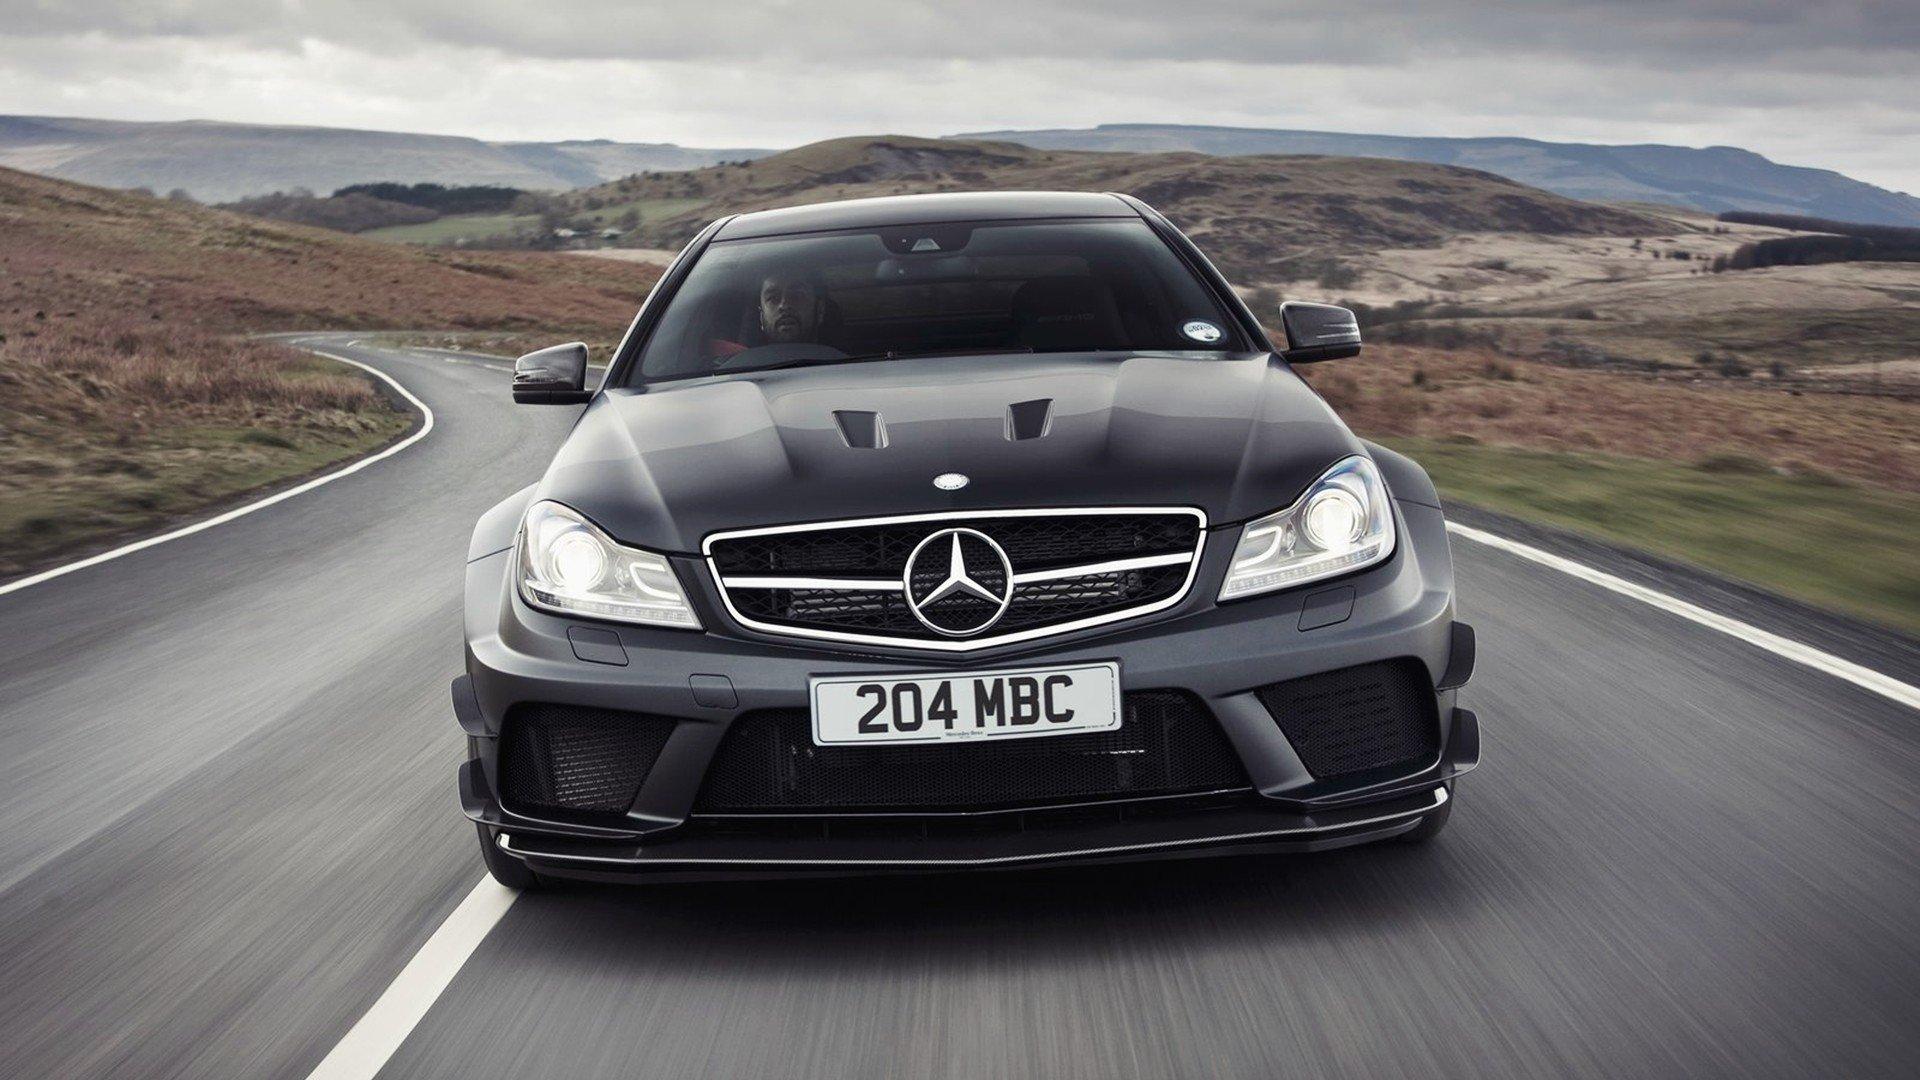 automotive royal respect - photo #4